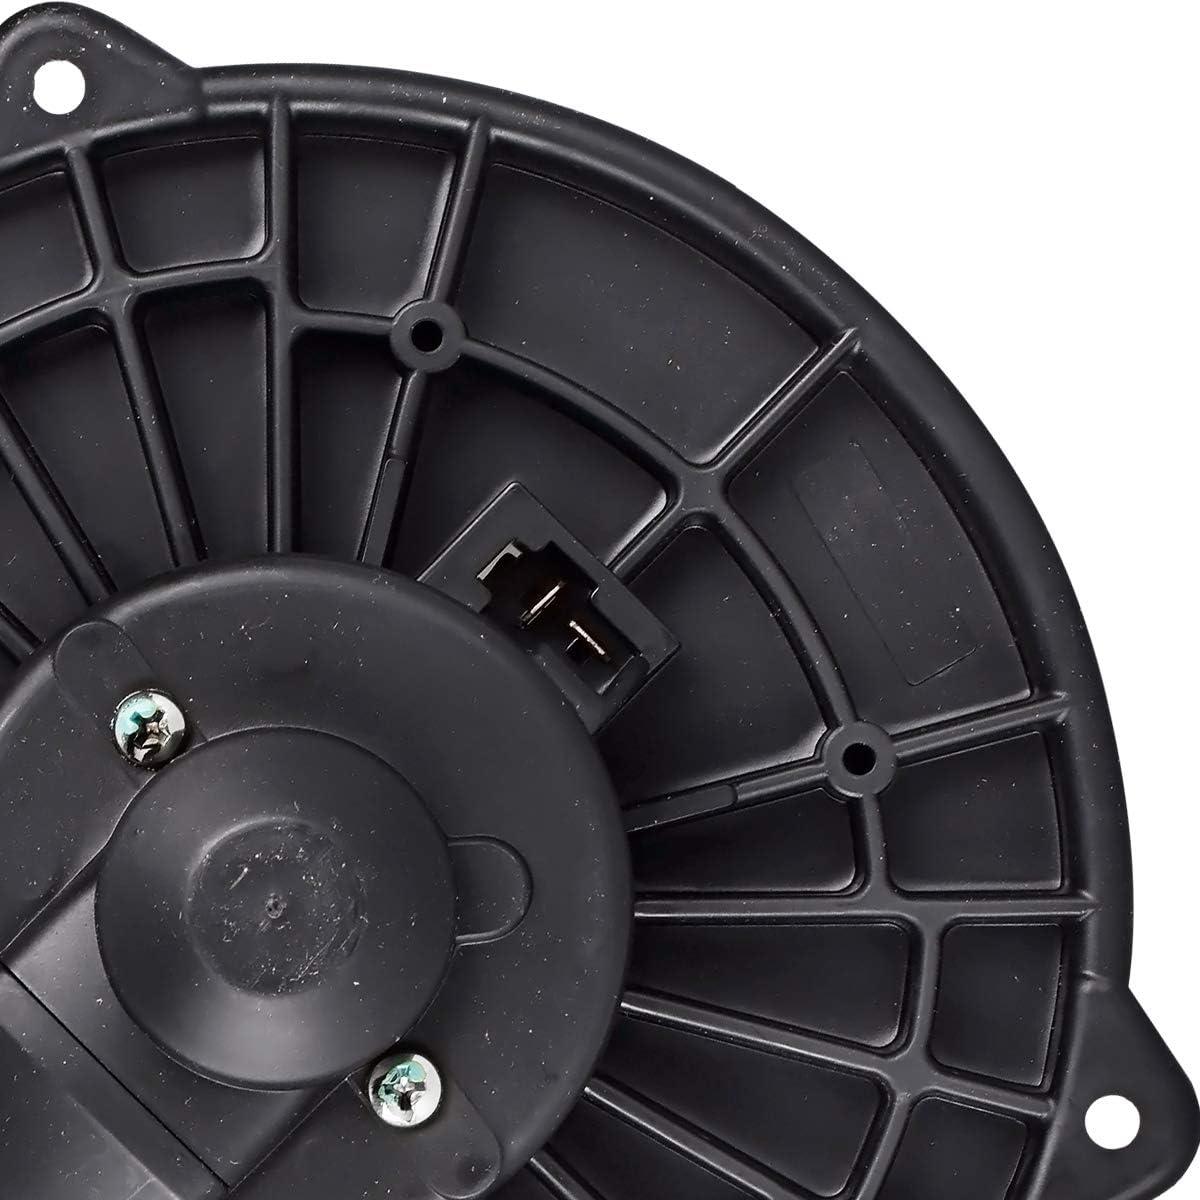 79310S5DA01 FAERSI HVAC Plastic Heater Blower Motor with Fan Cage Compatible with 2001-2005 Honda Civic,2001-2005 Acura EL,2002-2006 Honda CR-V,2003-2011 Honda Element Replaces 700005